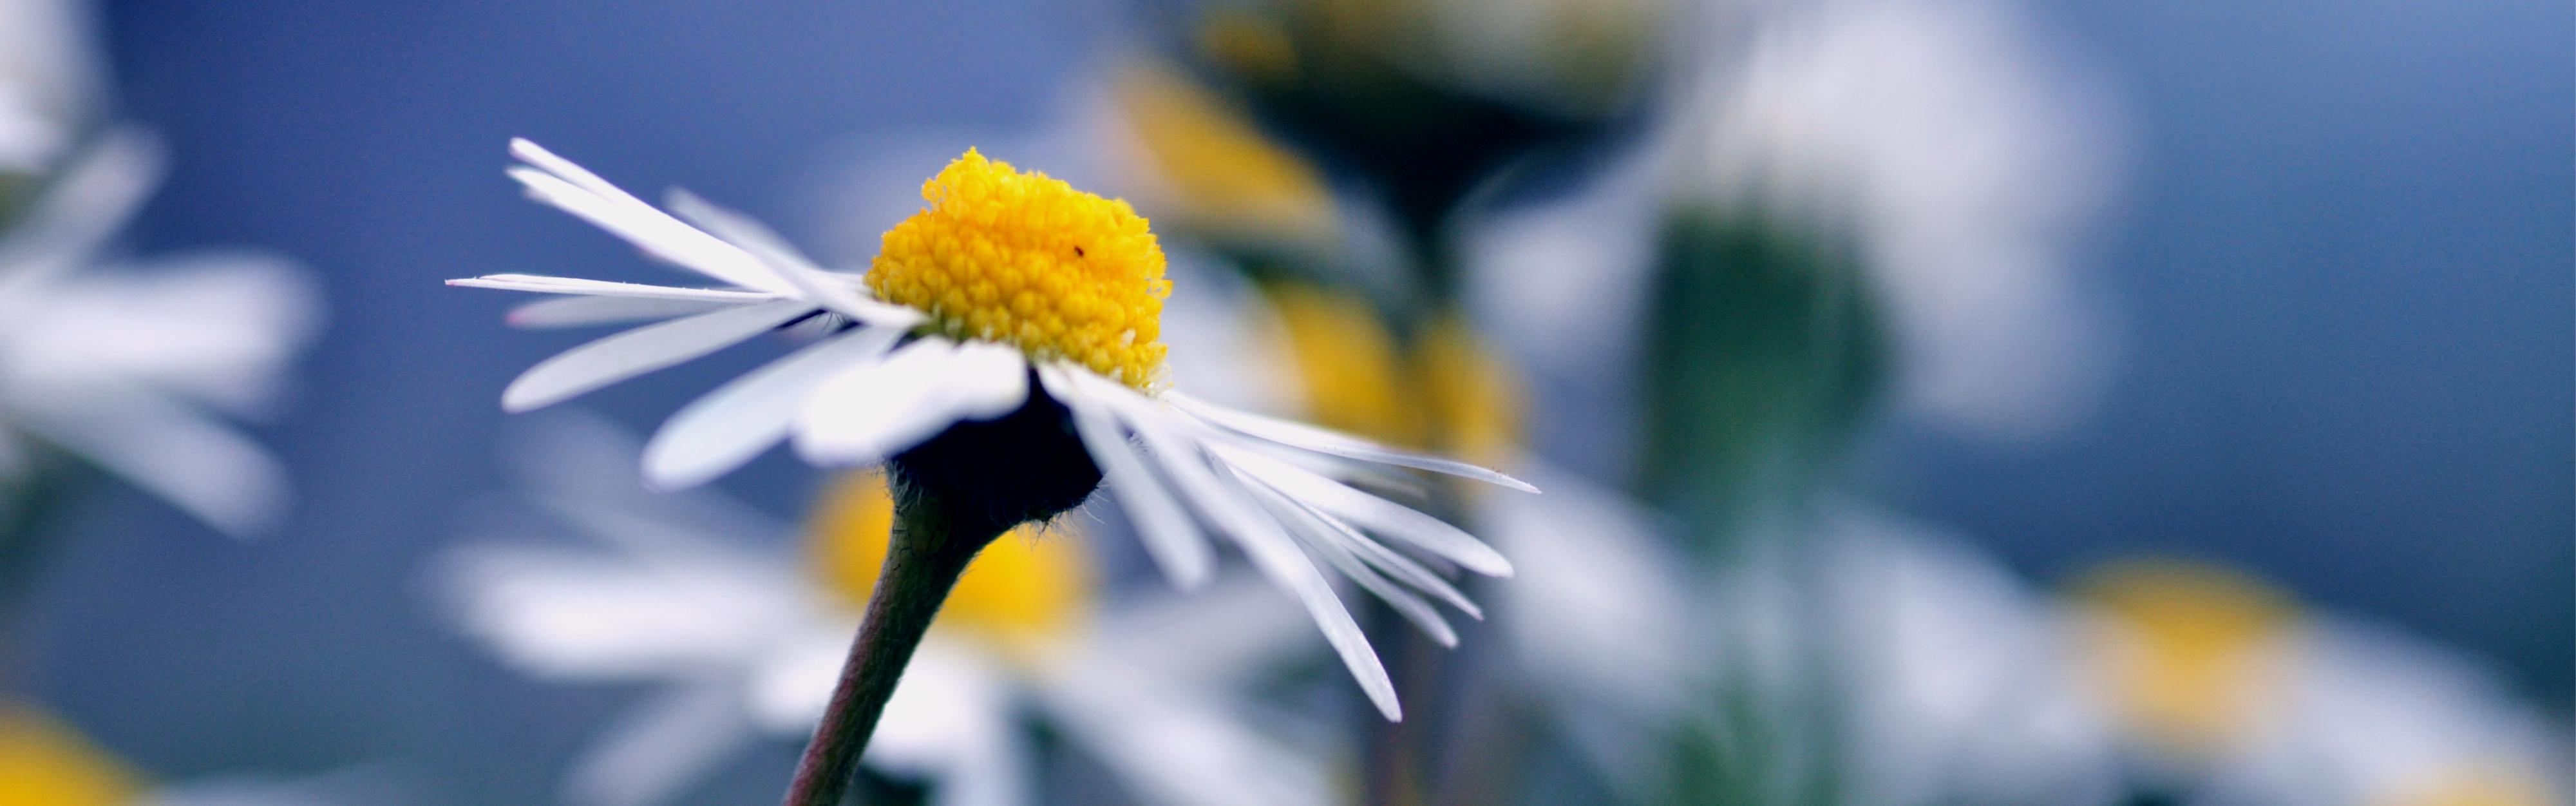 синий цветок ромашка макро без смс